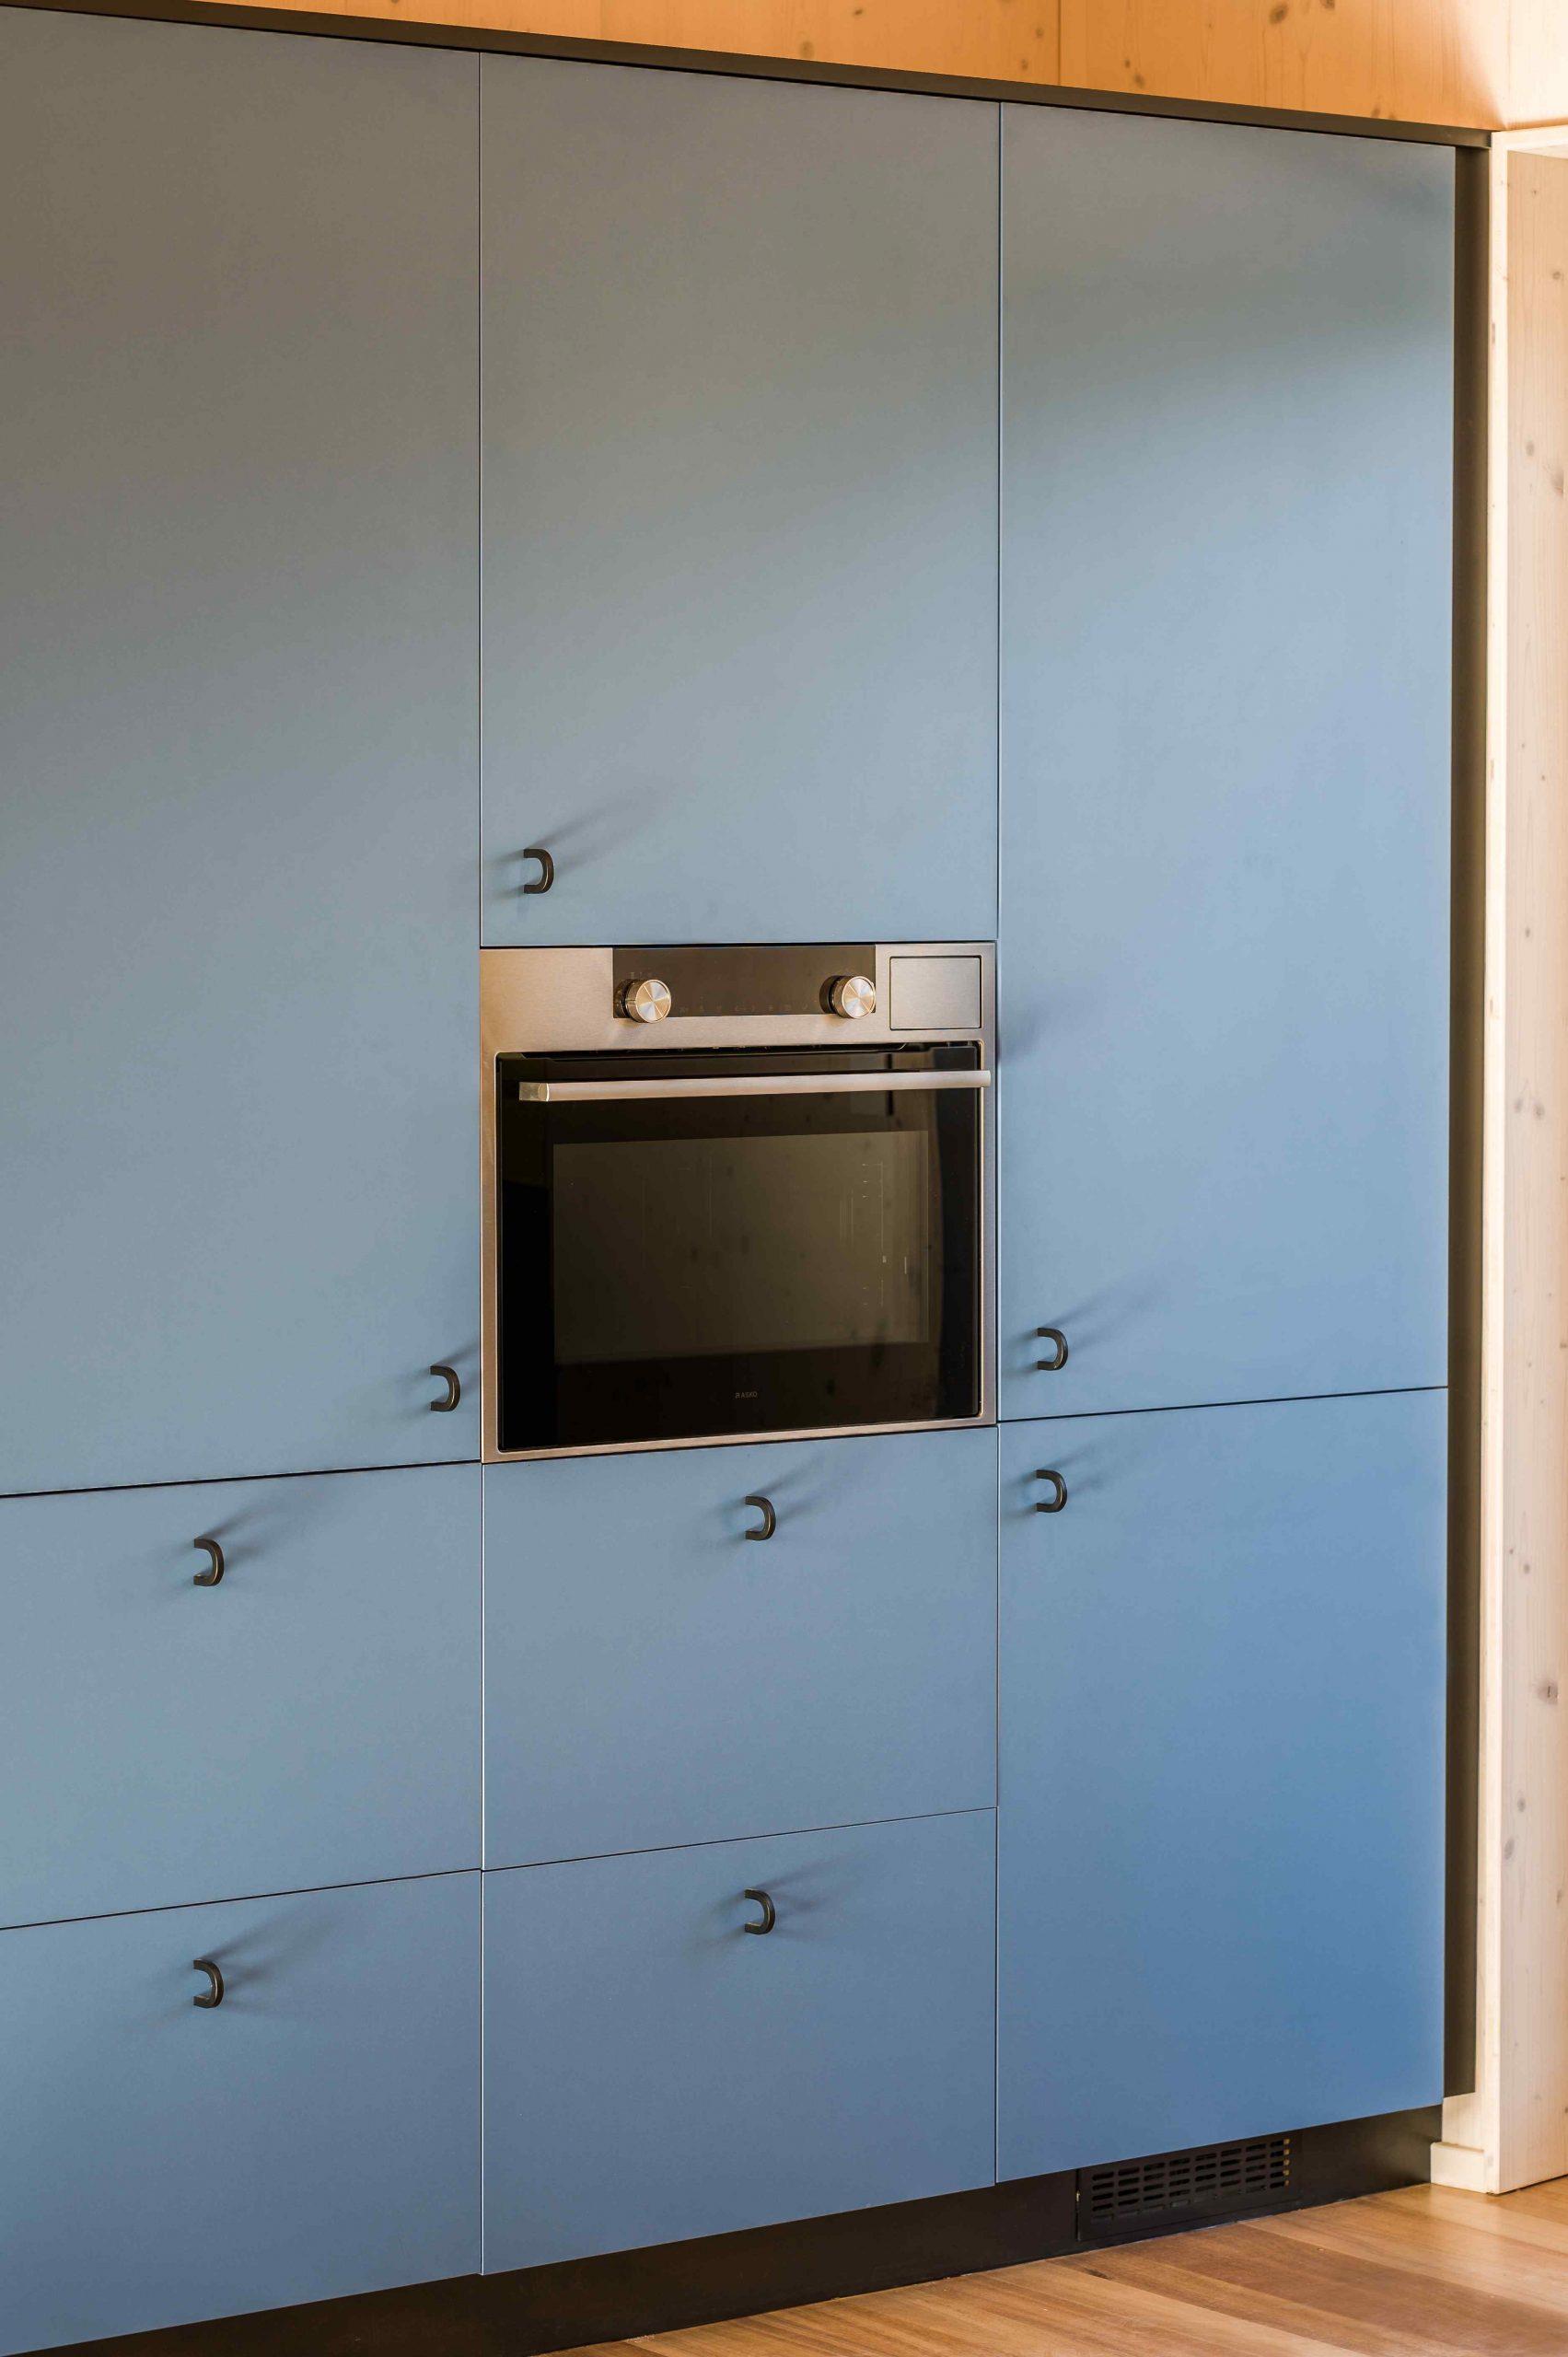 Unit Kitchen Oven Cupboard